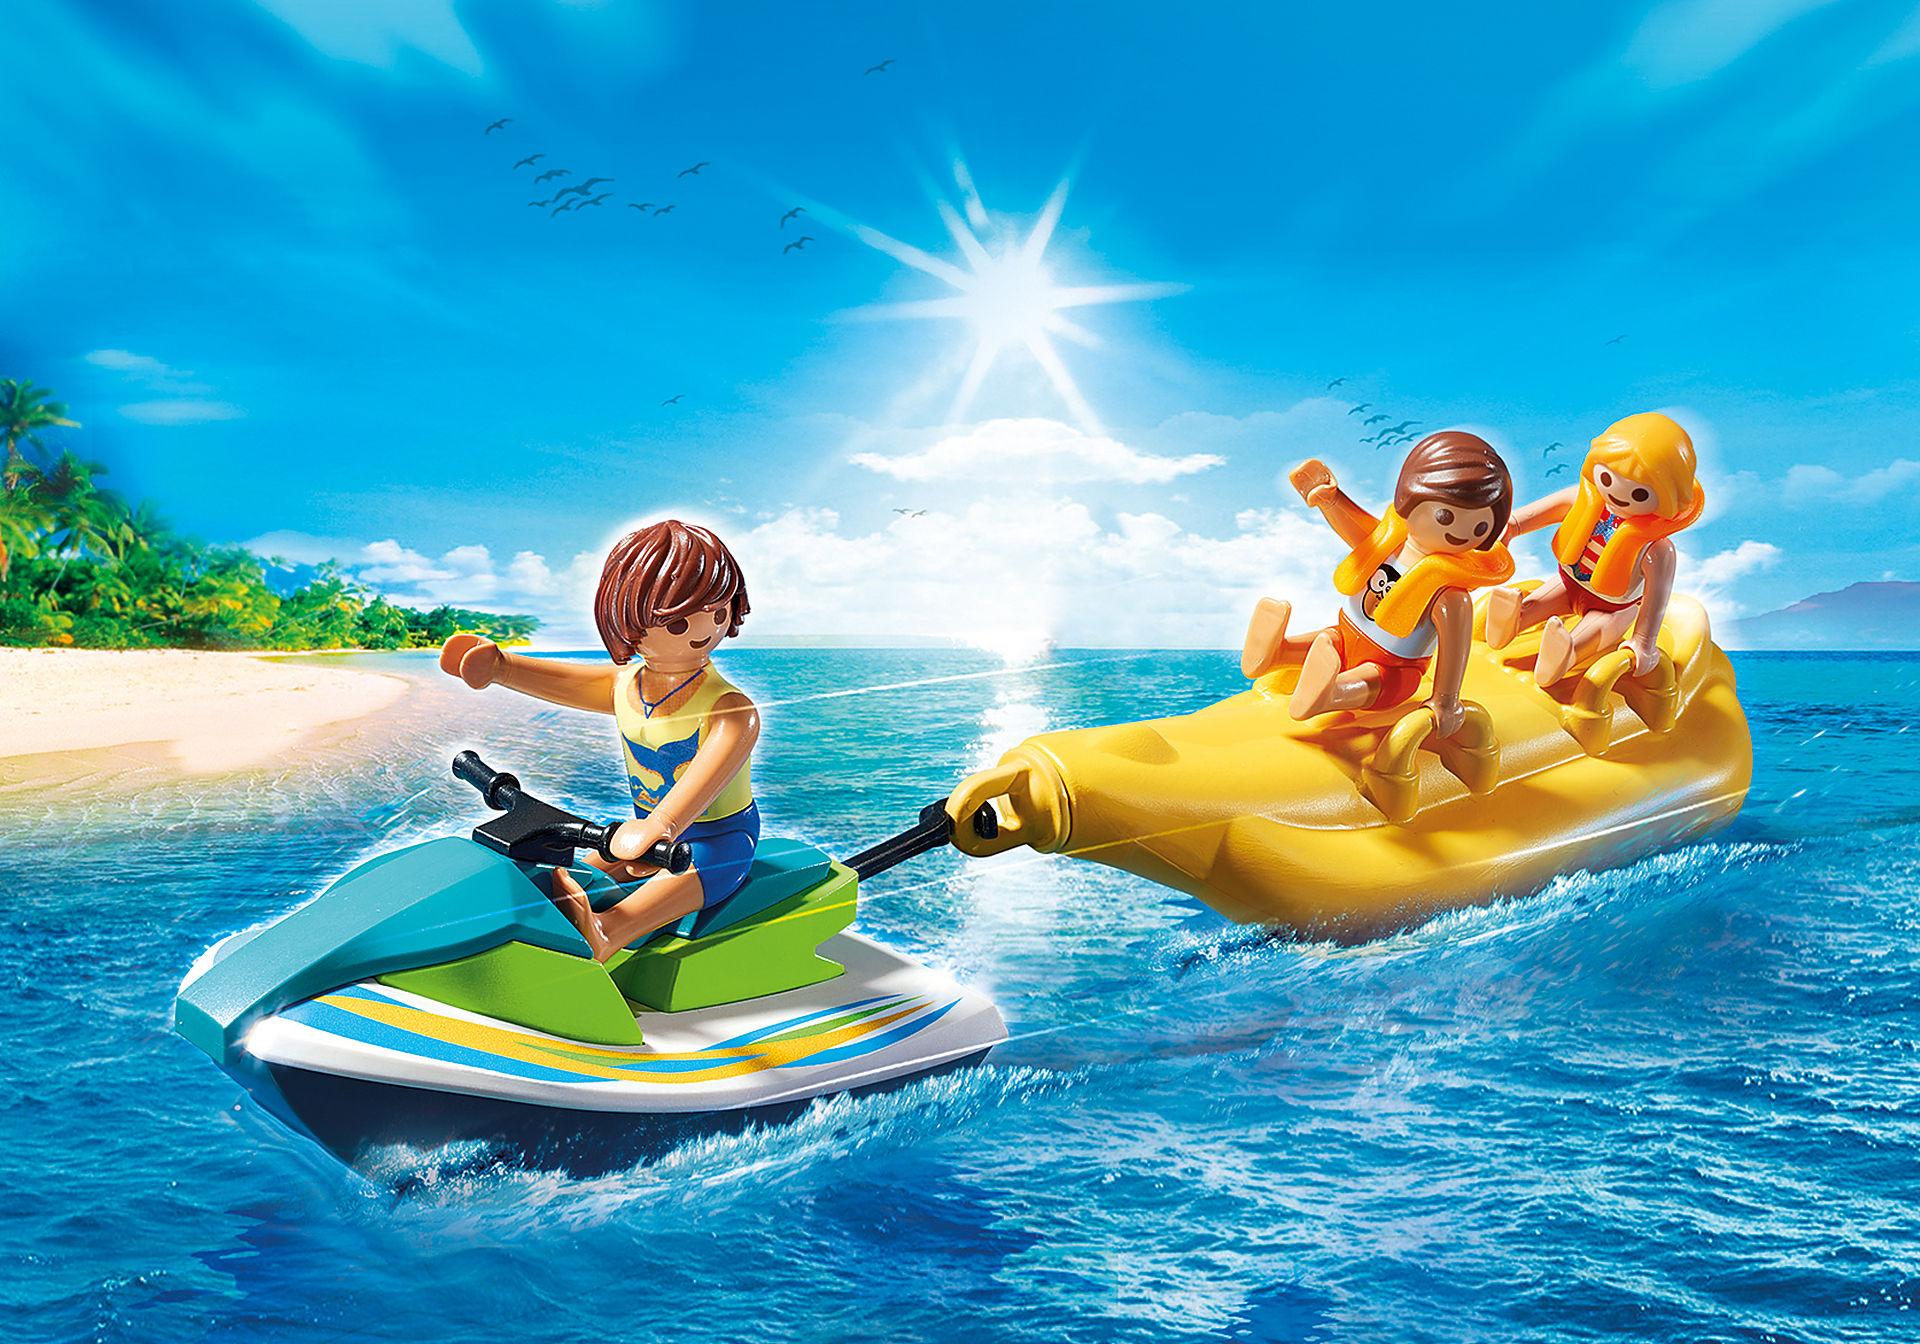 9163 Island Banana Boat Ride zoom image1